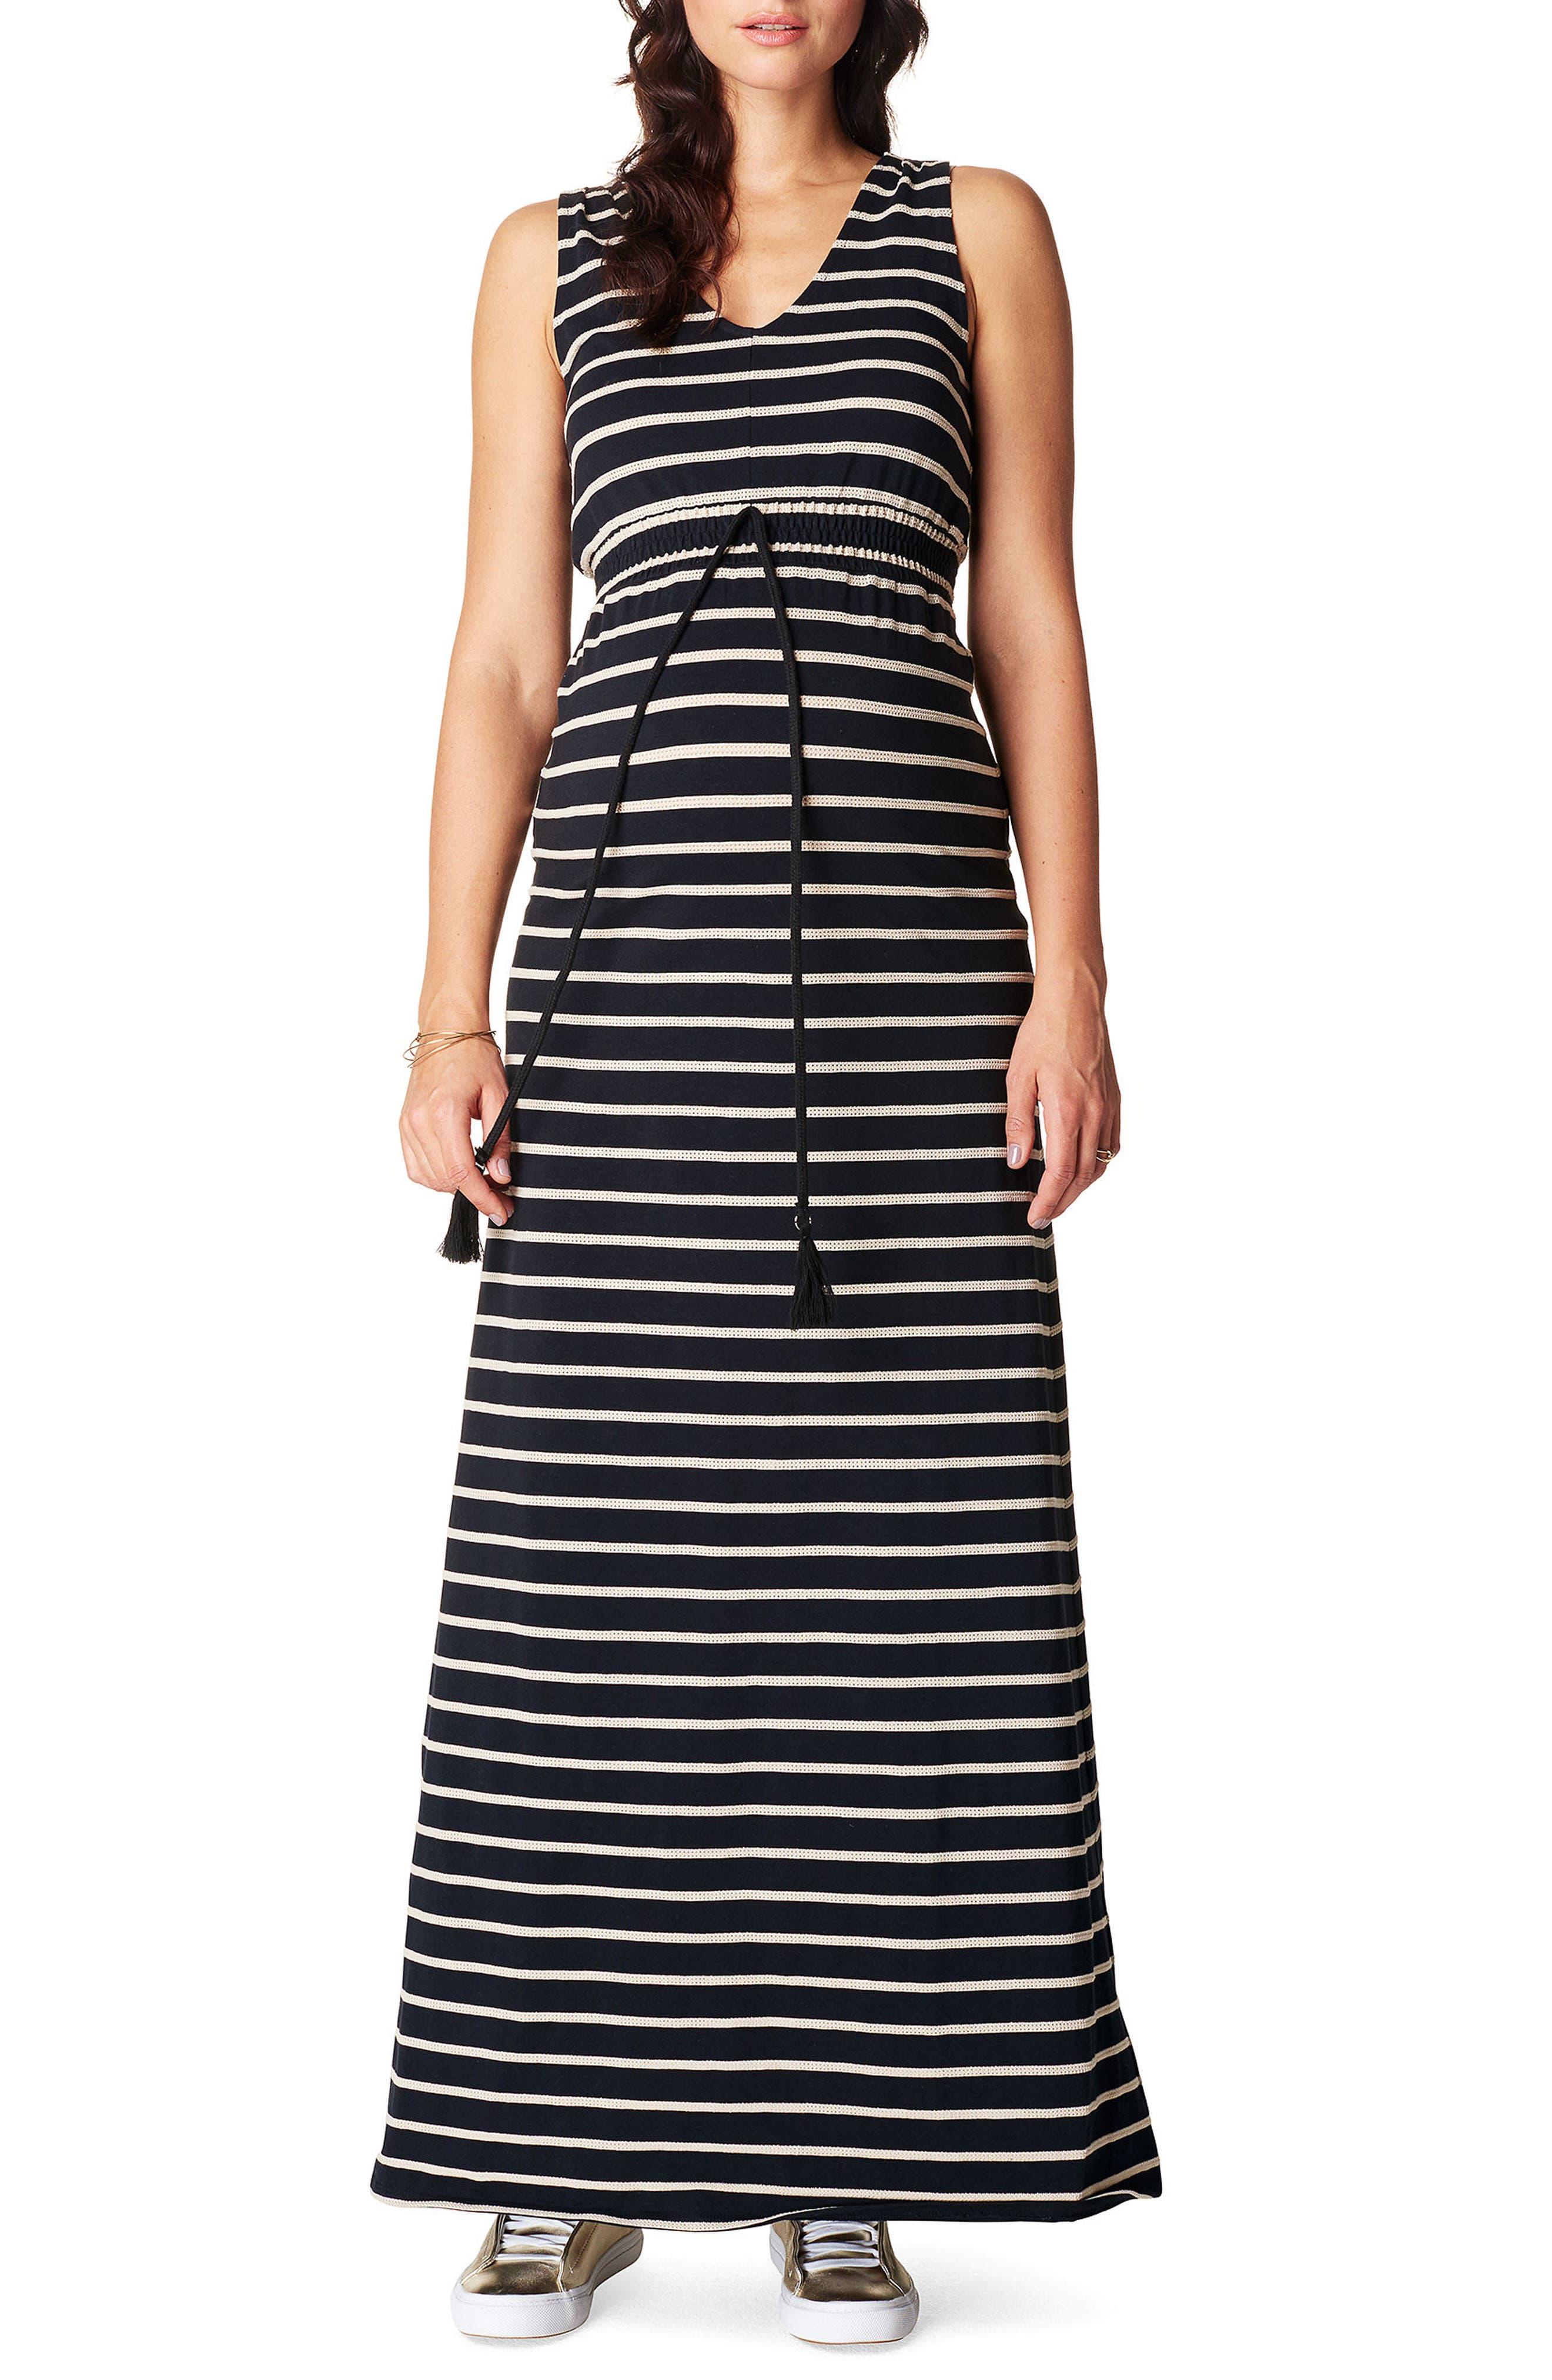 Mila Maternity Maxi Dress,                             Main thumbnail 1, color,                             BLACK